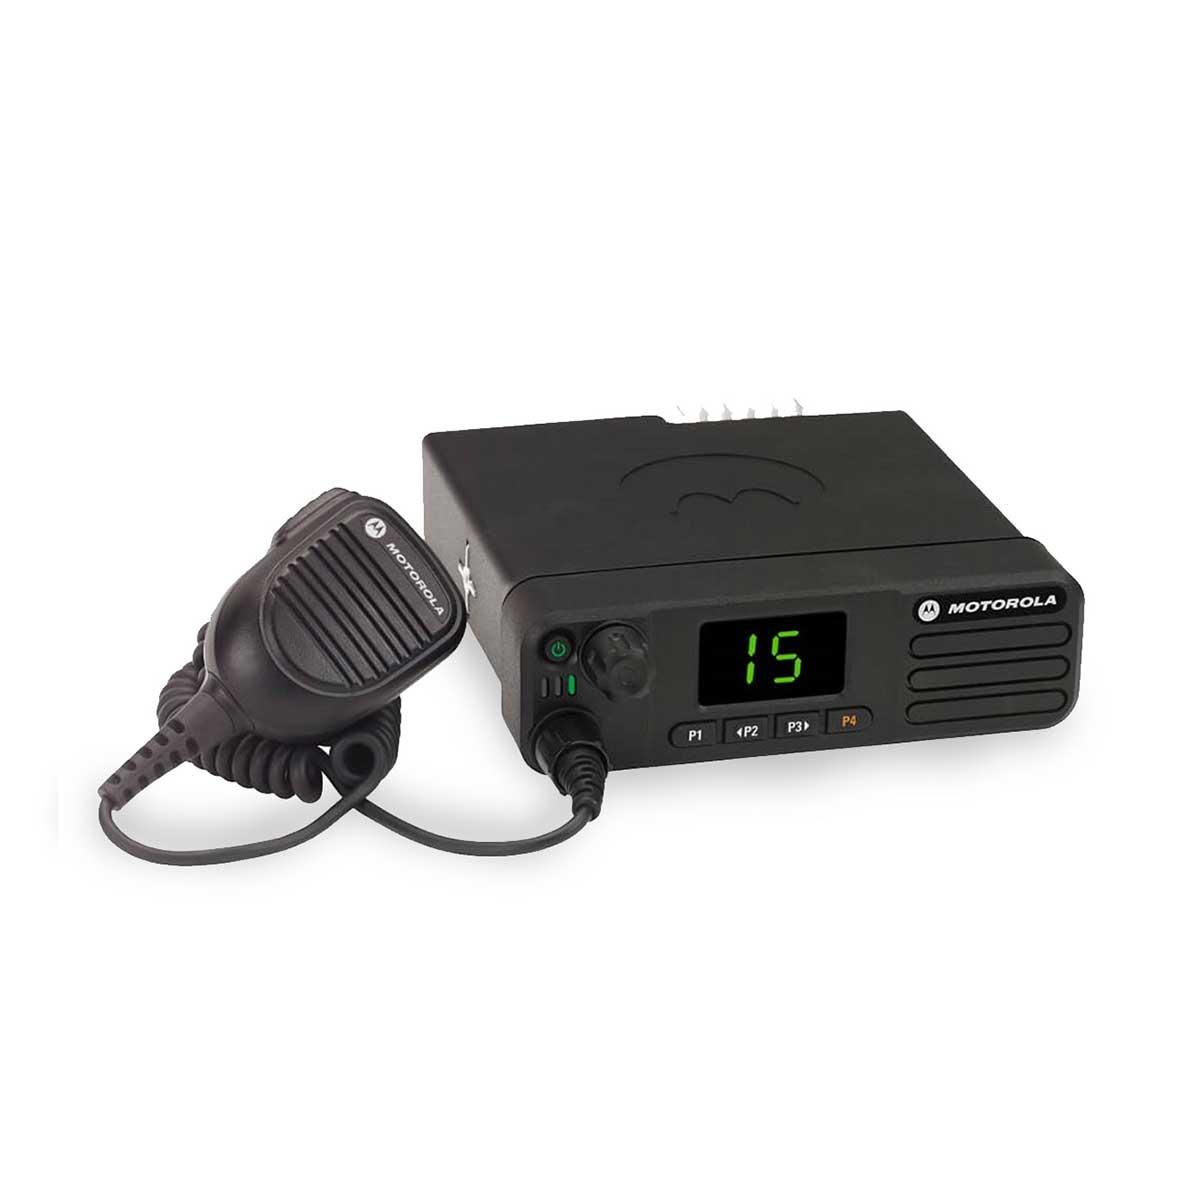 Radio Motorola DGM5000 Digital LAM28QNC9MA1AN UHF 403-470 MHZ de 25W